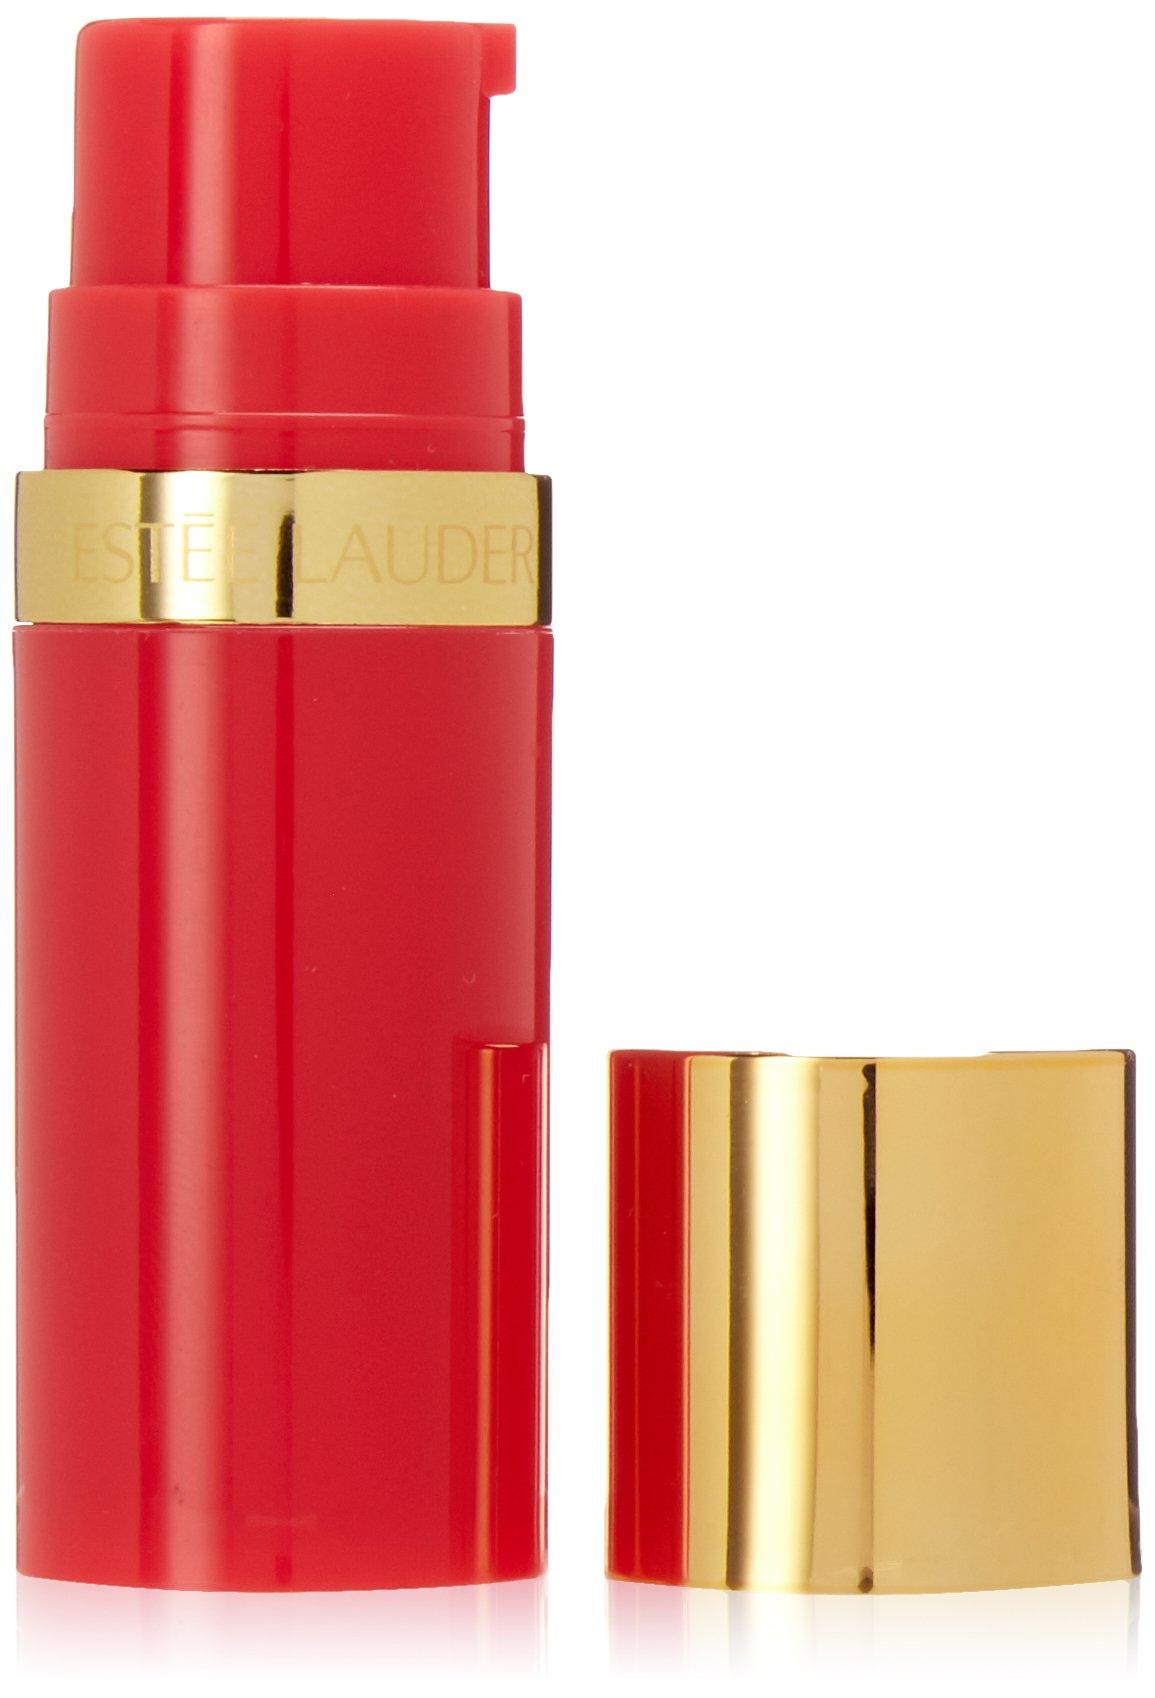 Estee Lauder Pure Color Cheek Rush No. 01 Hot Fuse for Women Gel Blush, Fresh Sheer, Fresh Sheer, 0.28 Ounce